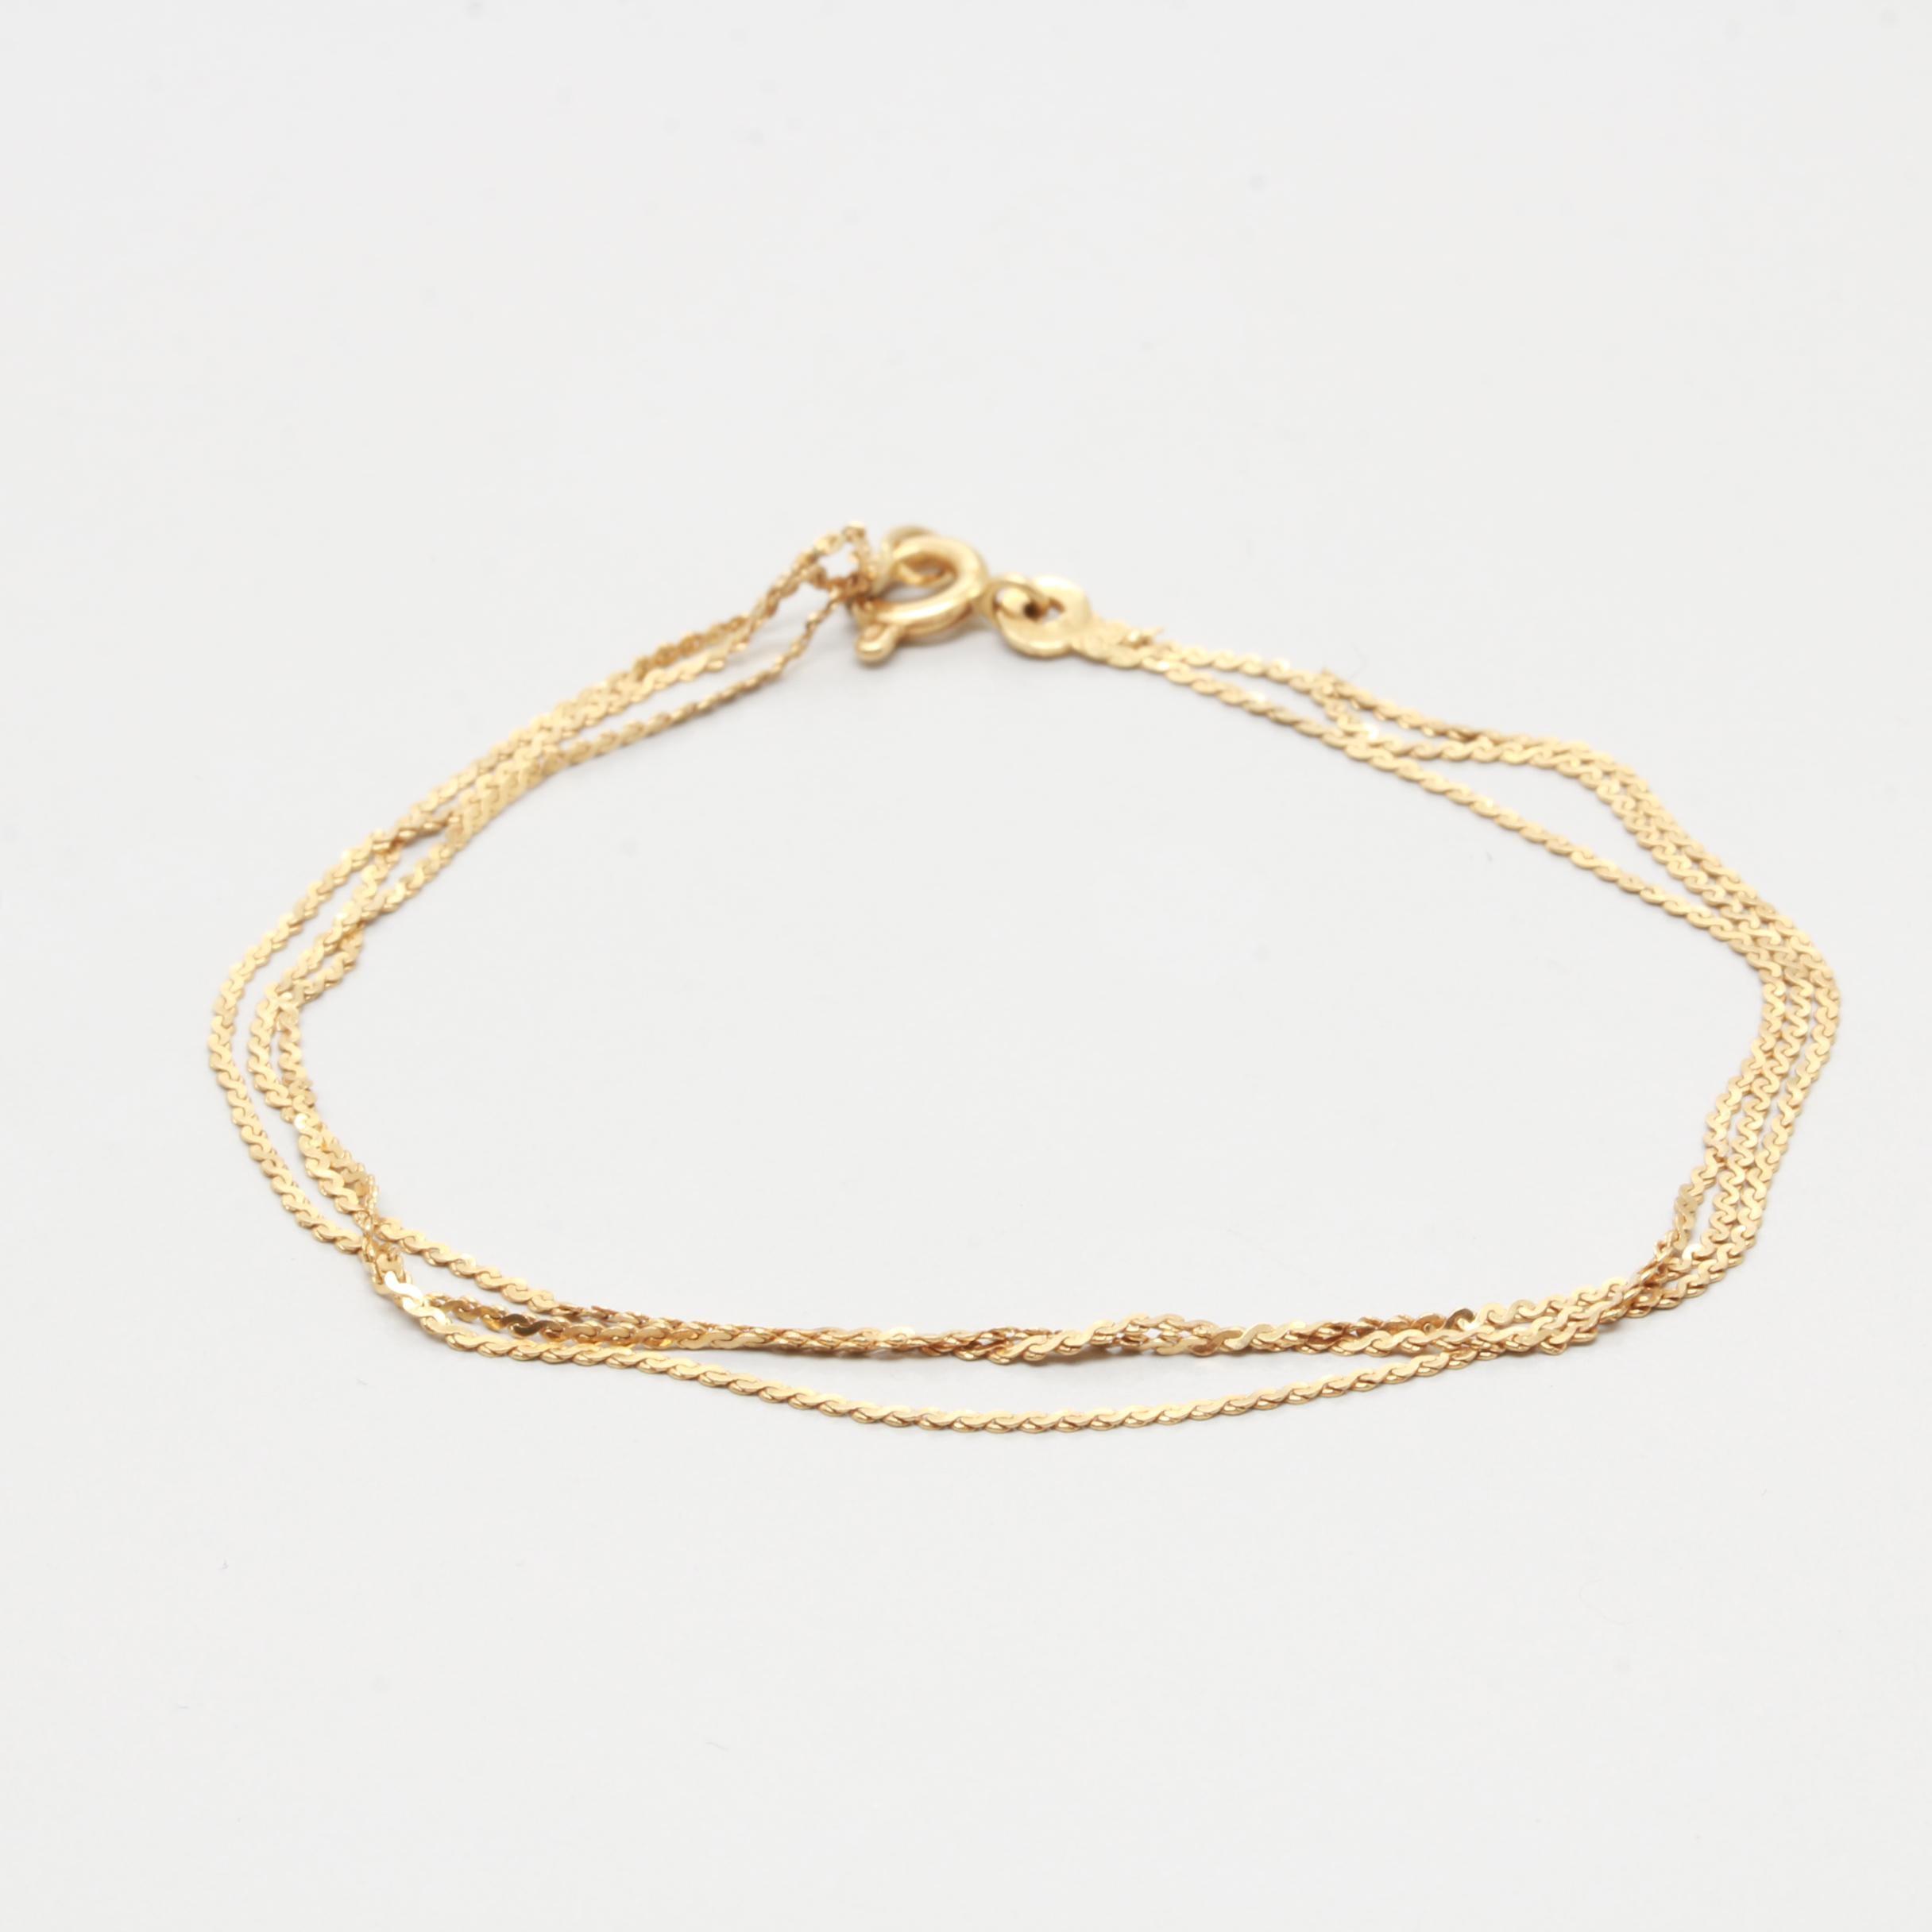 18K Yellow Gold Tri Strand Serpentine Bracelet